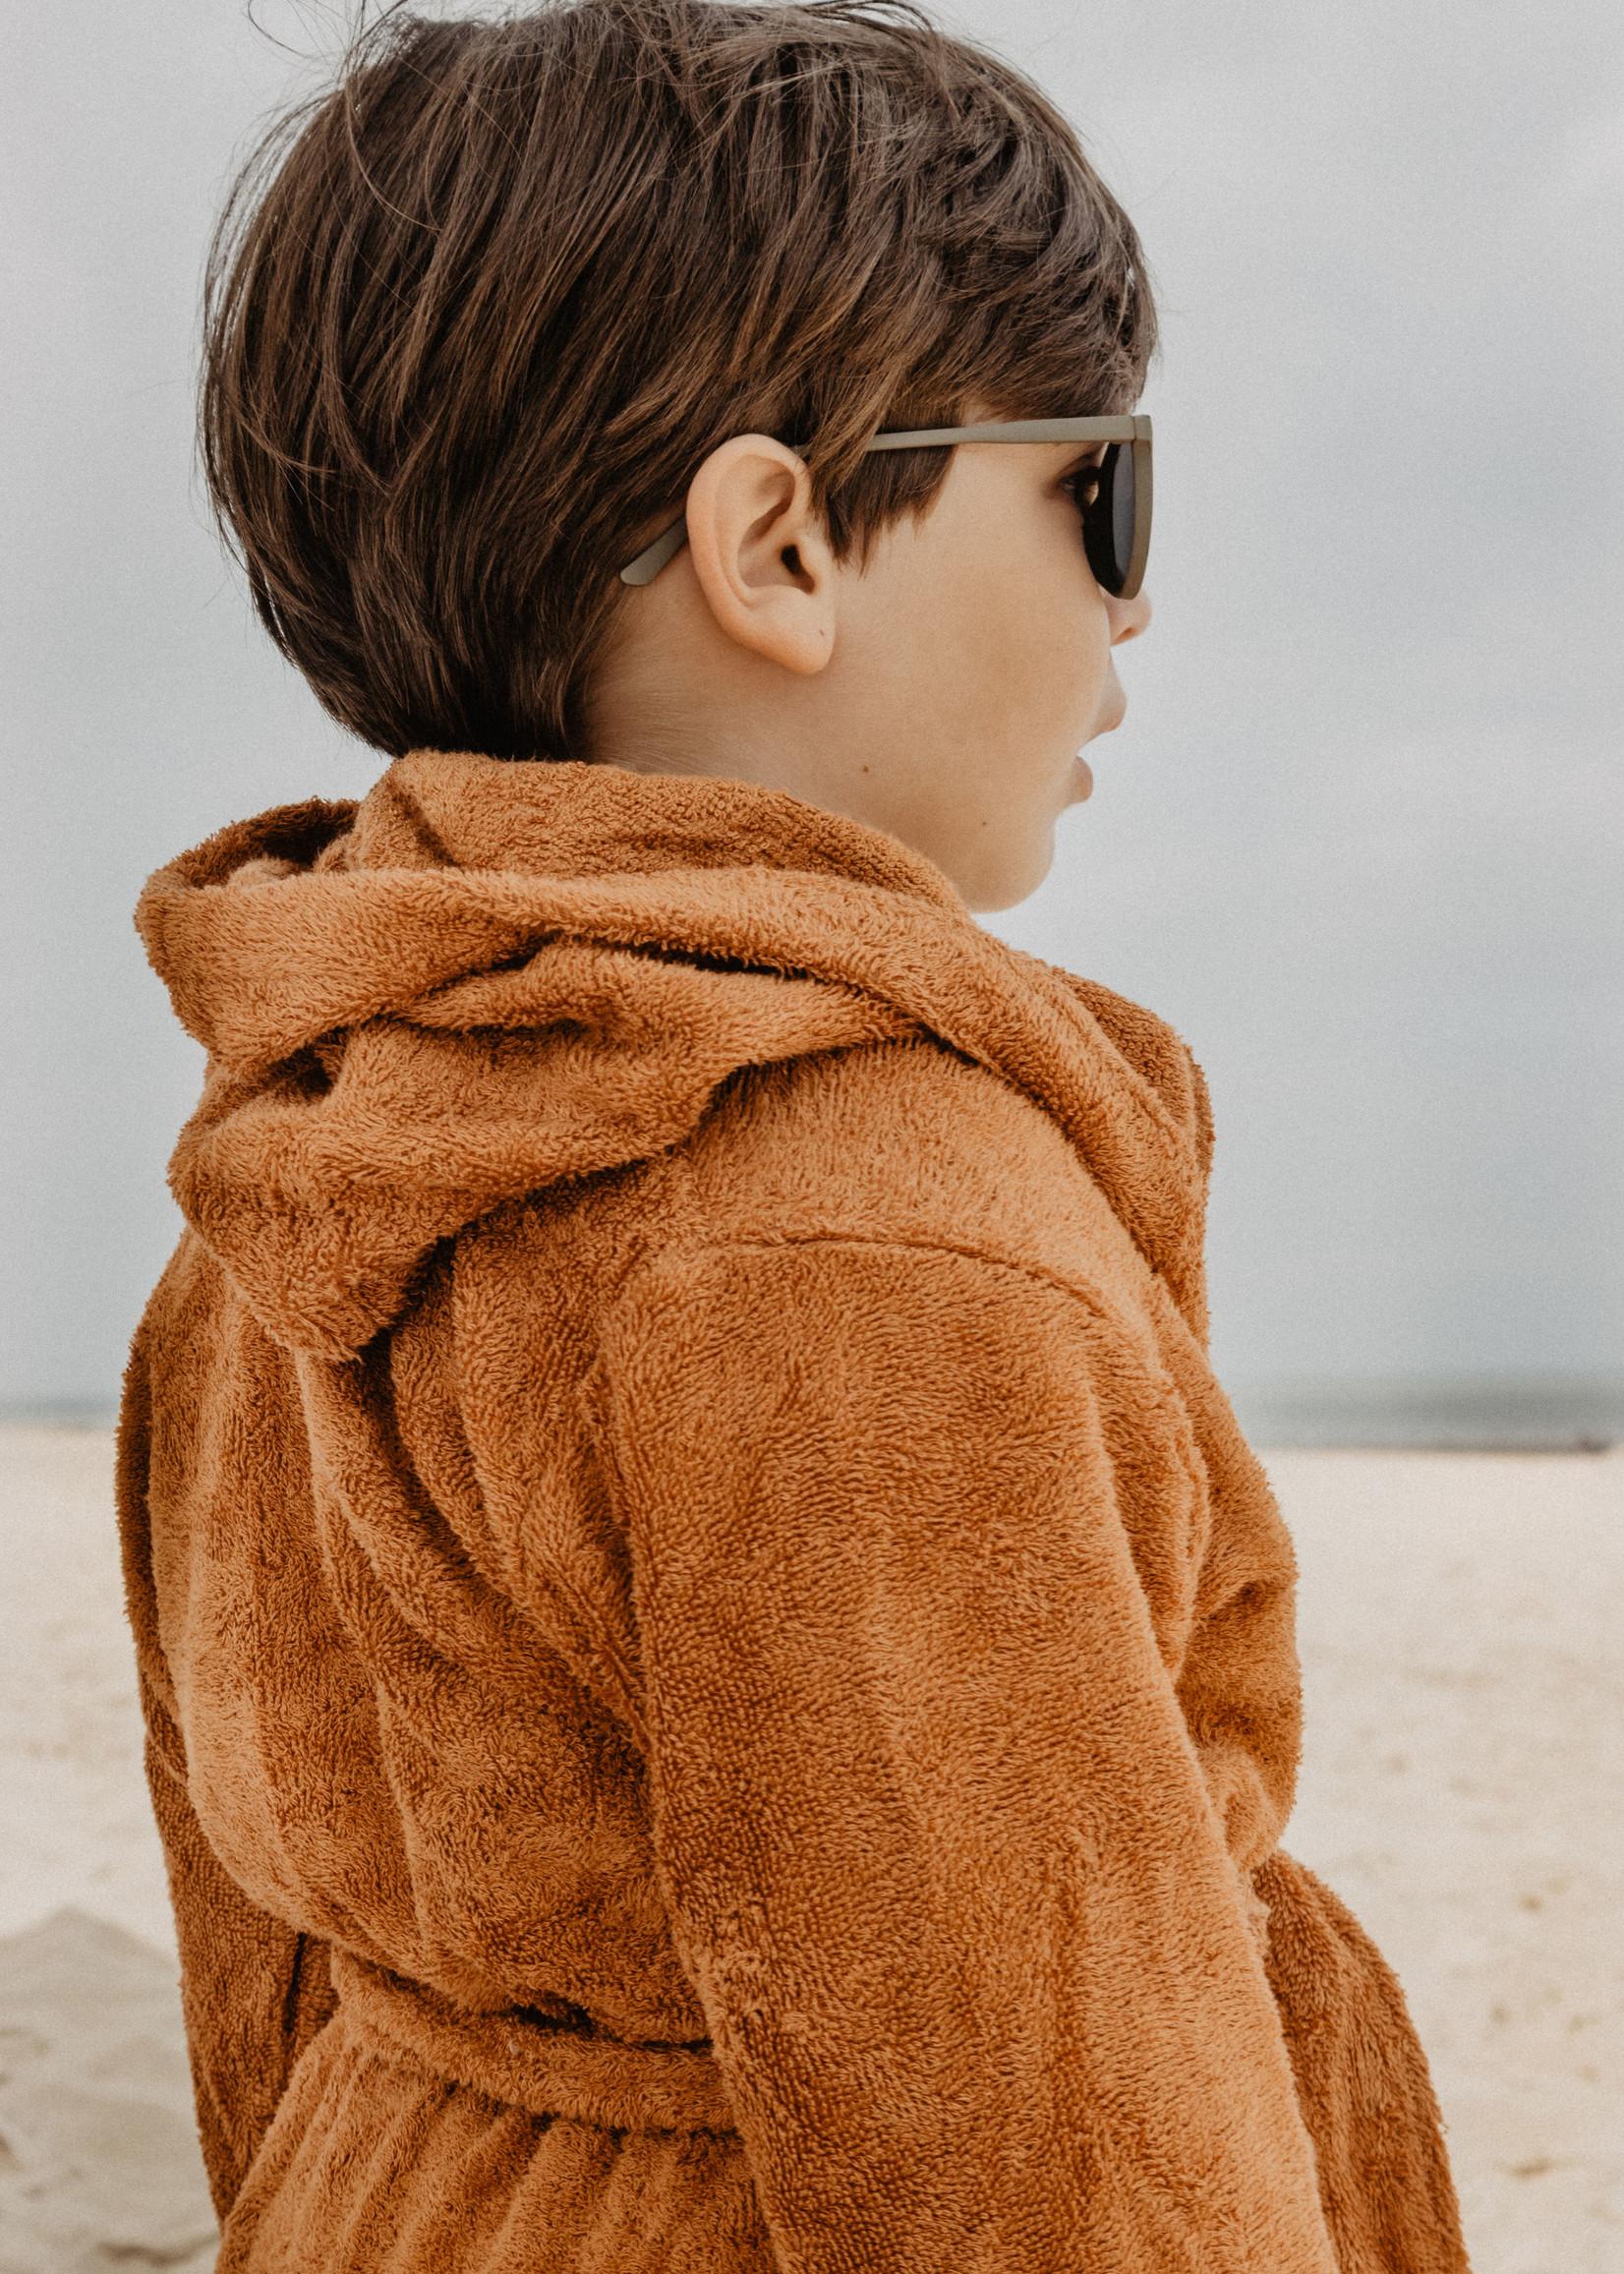 Timboo Bathrobe Kids - Inca Rust